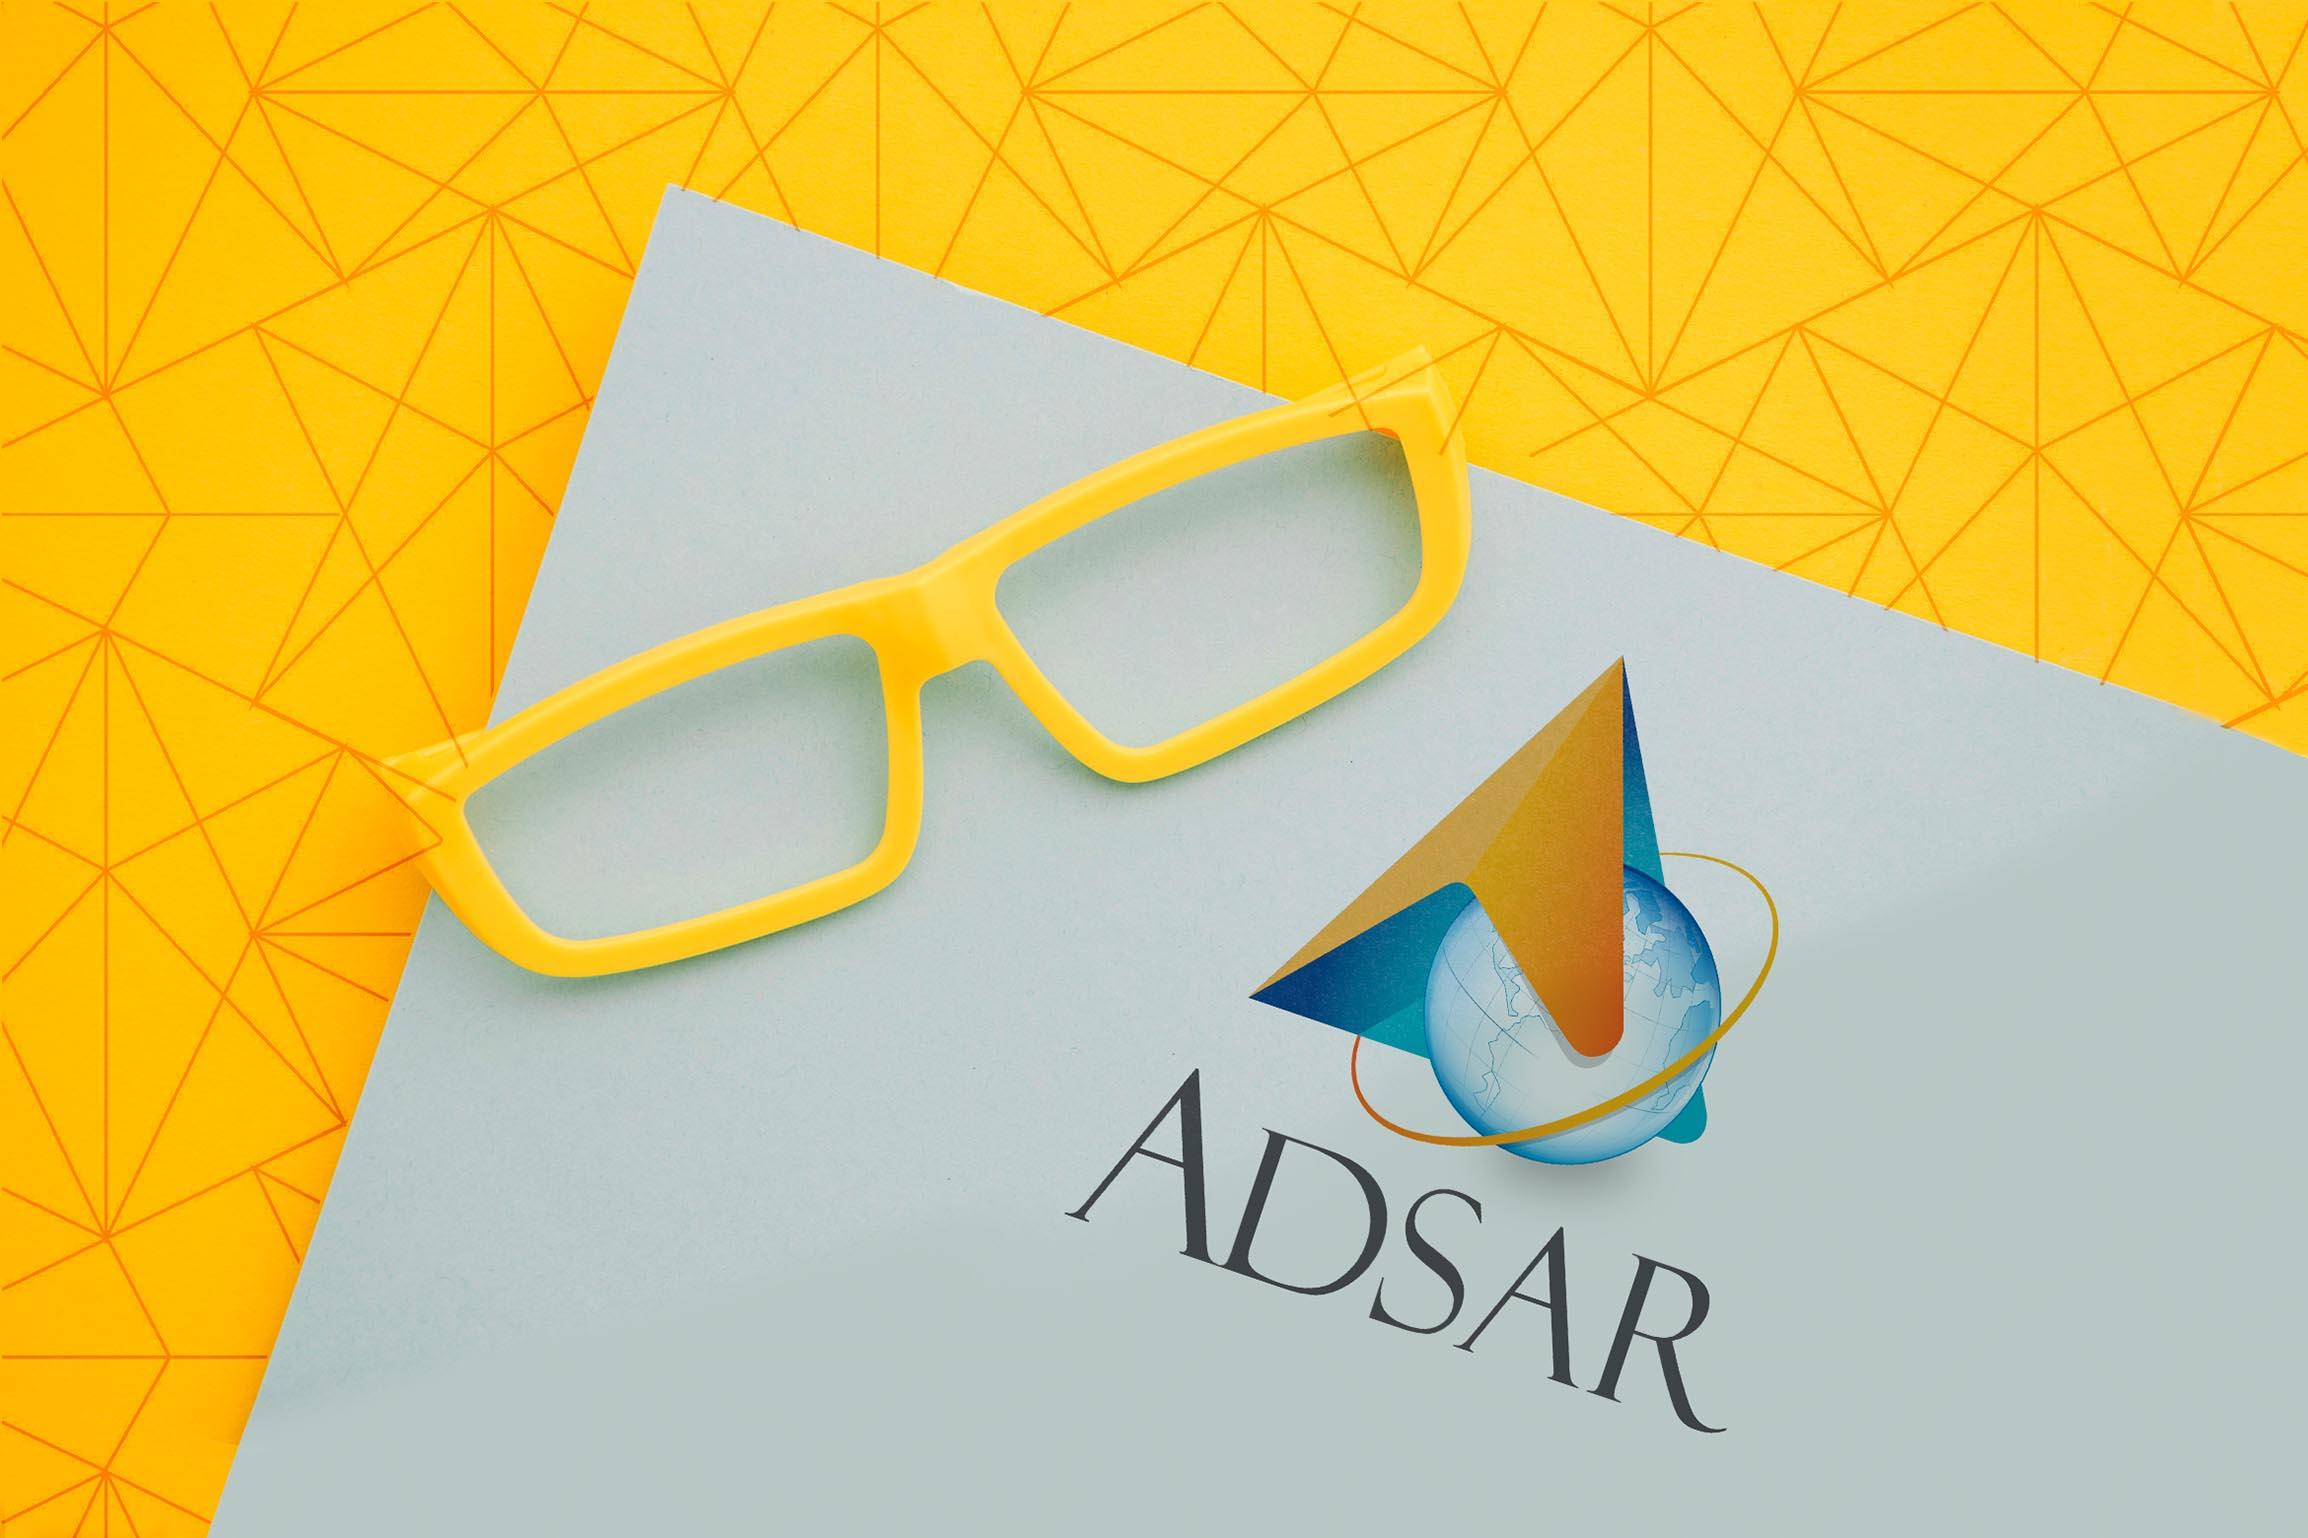 Adsar Labs Logo